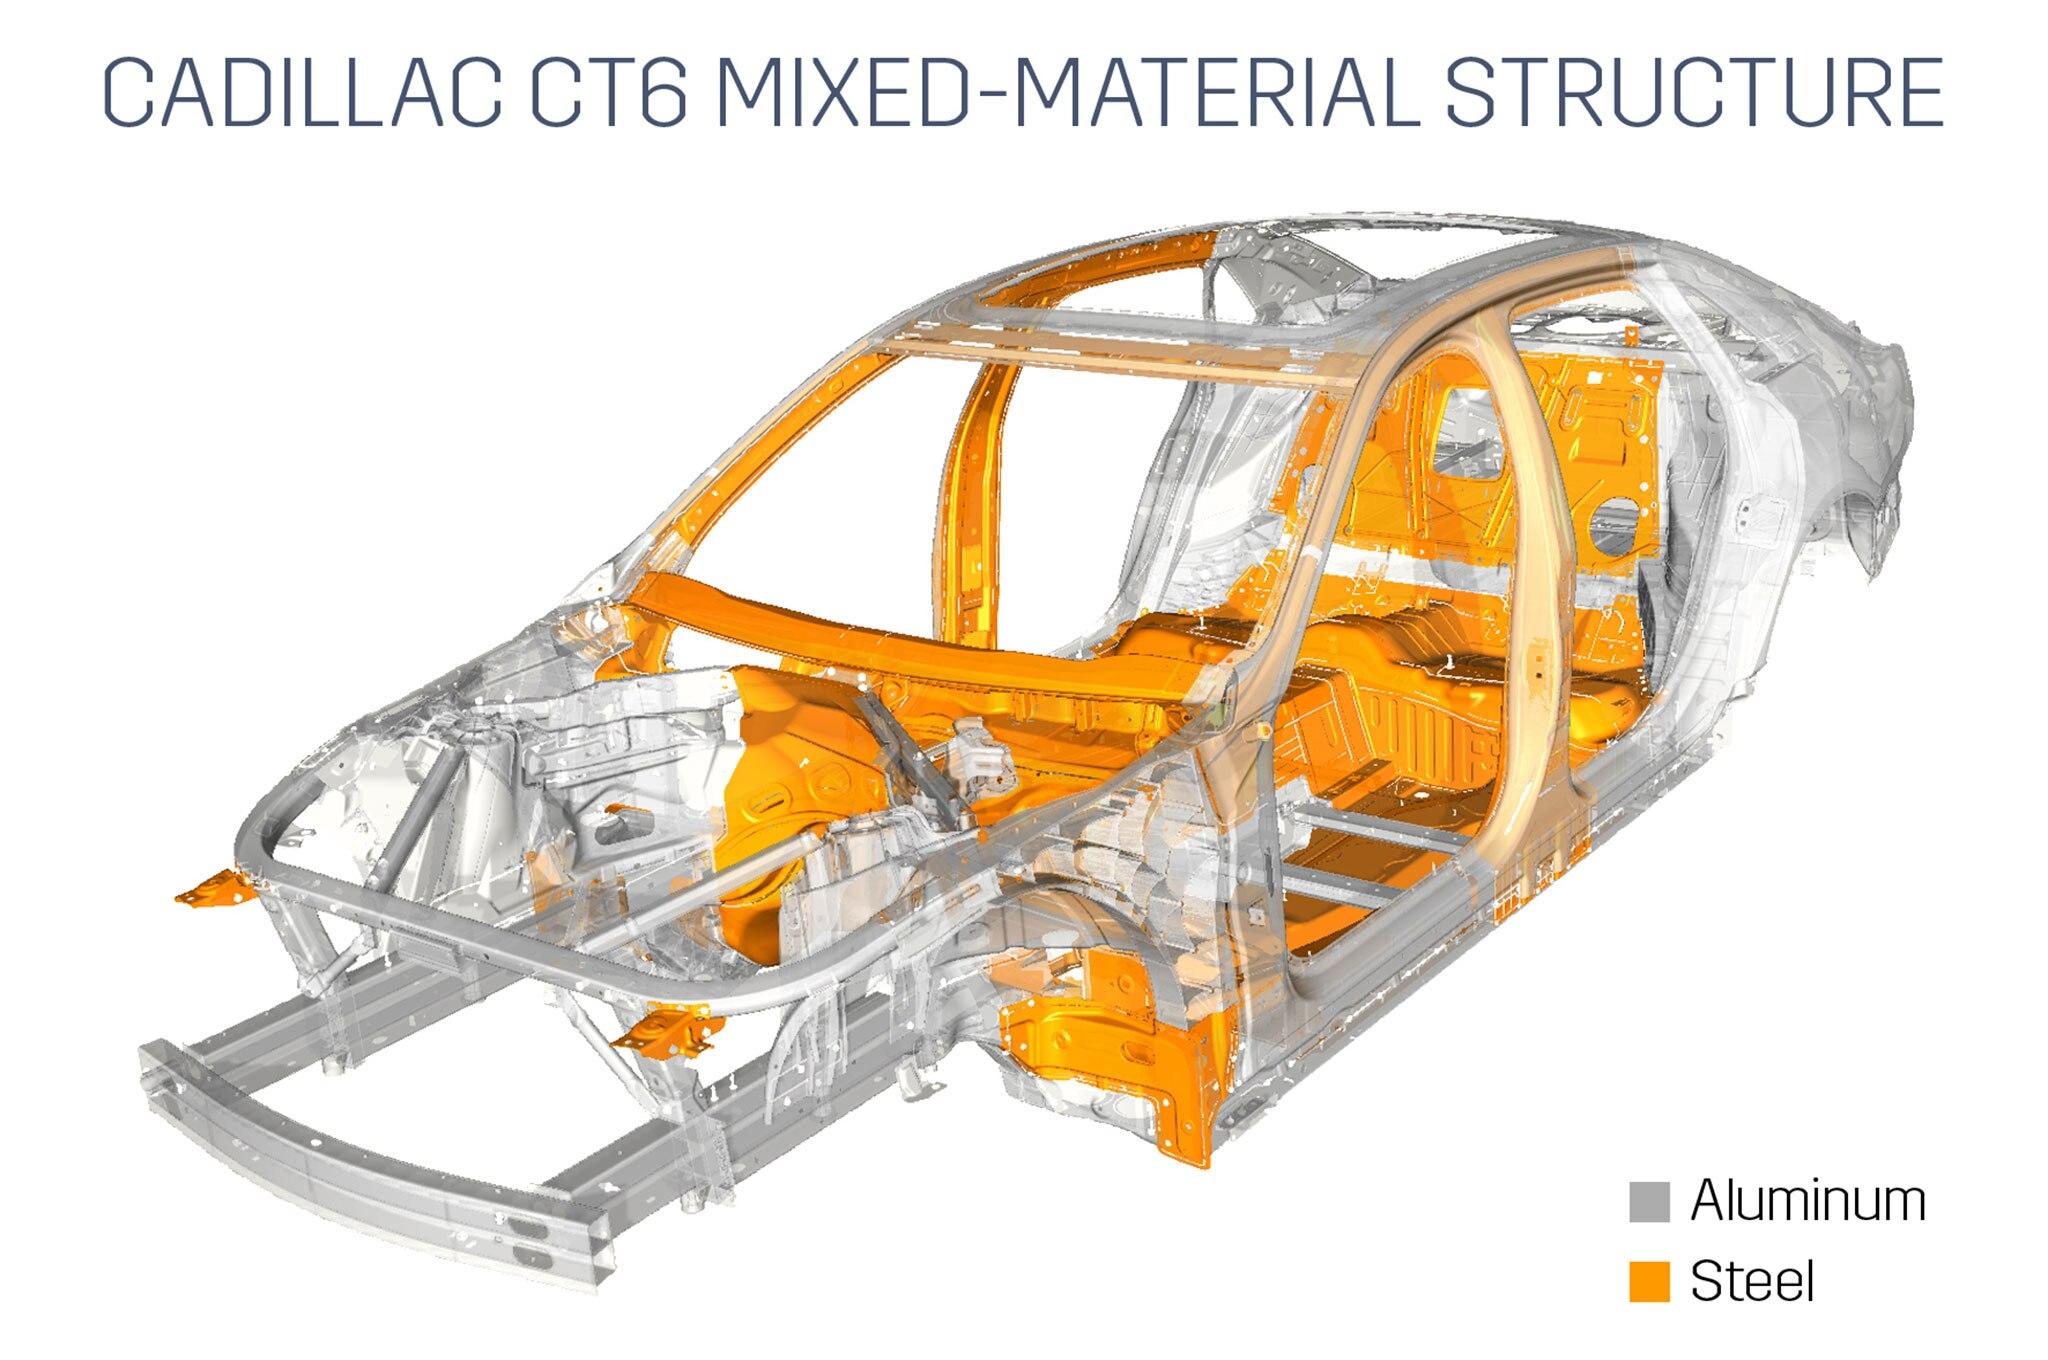 Cadillac Ct6 Aluminum Construction Saves 198 Pounds